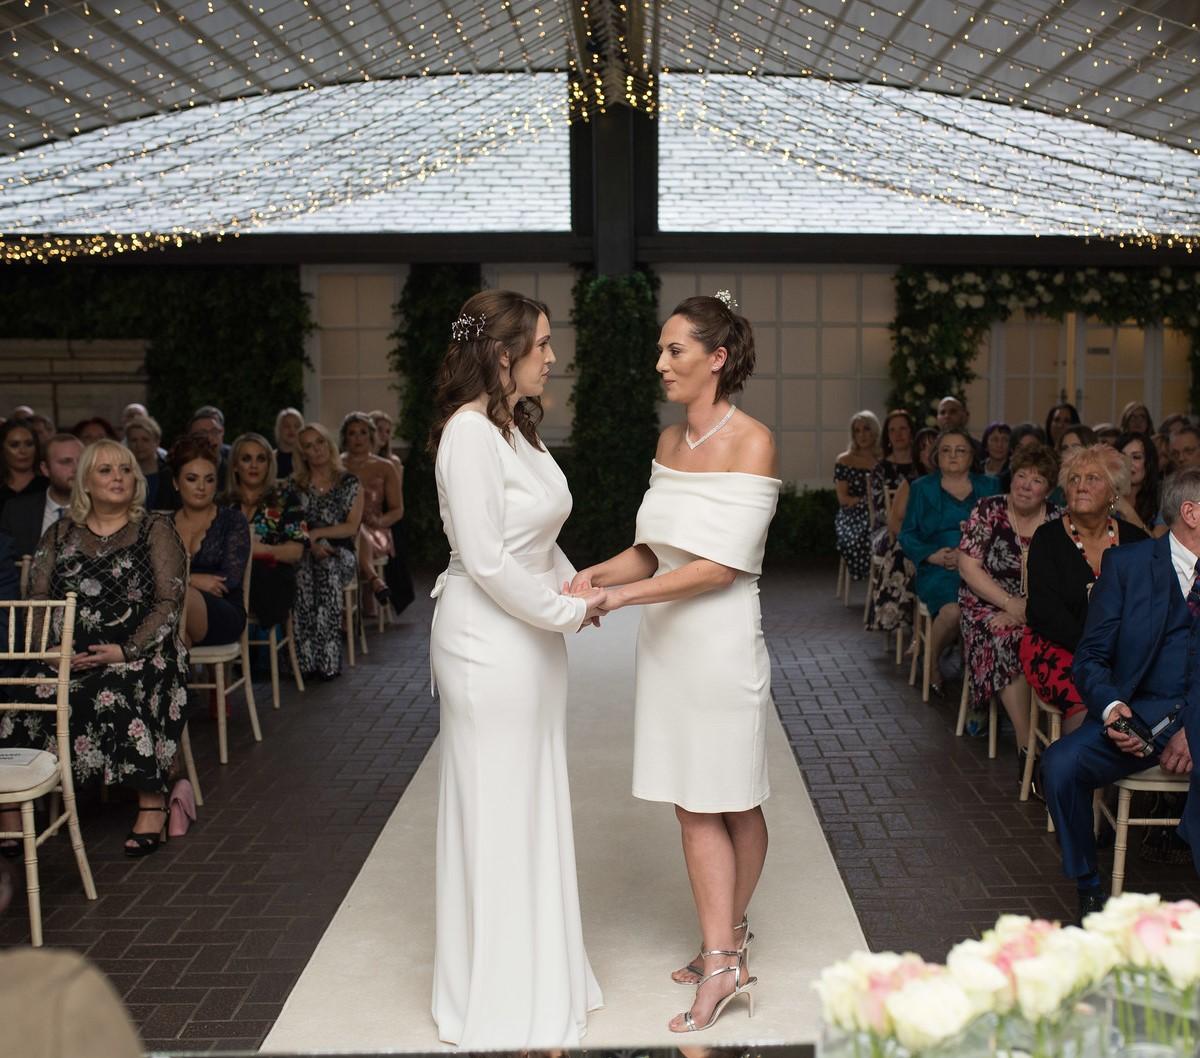 Susan Sumner & Marissa Farrell – Beautiful Brides